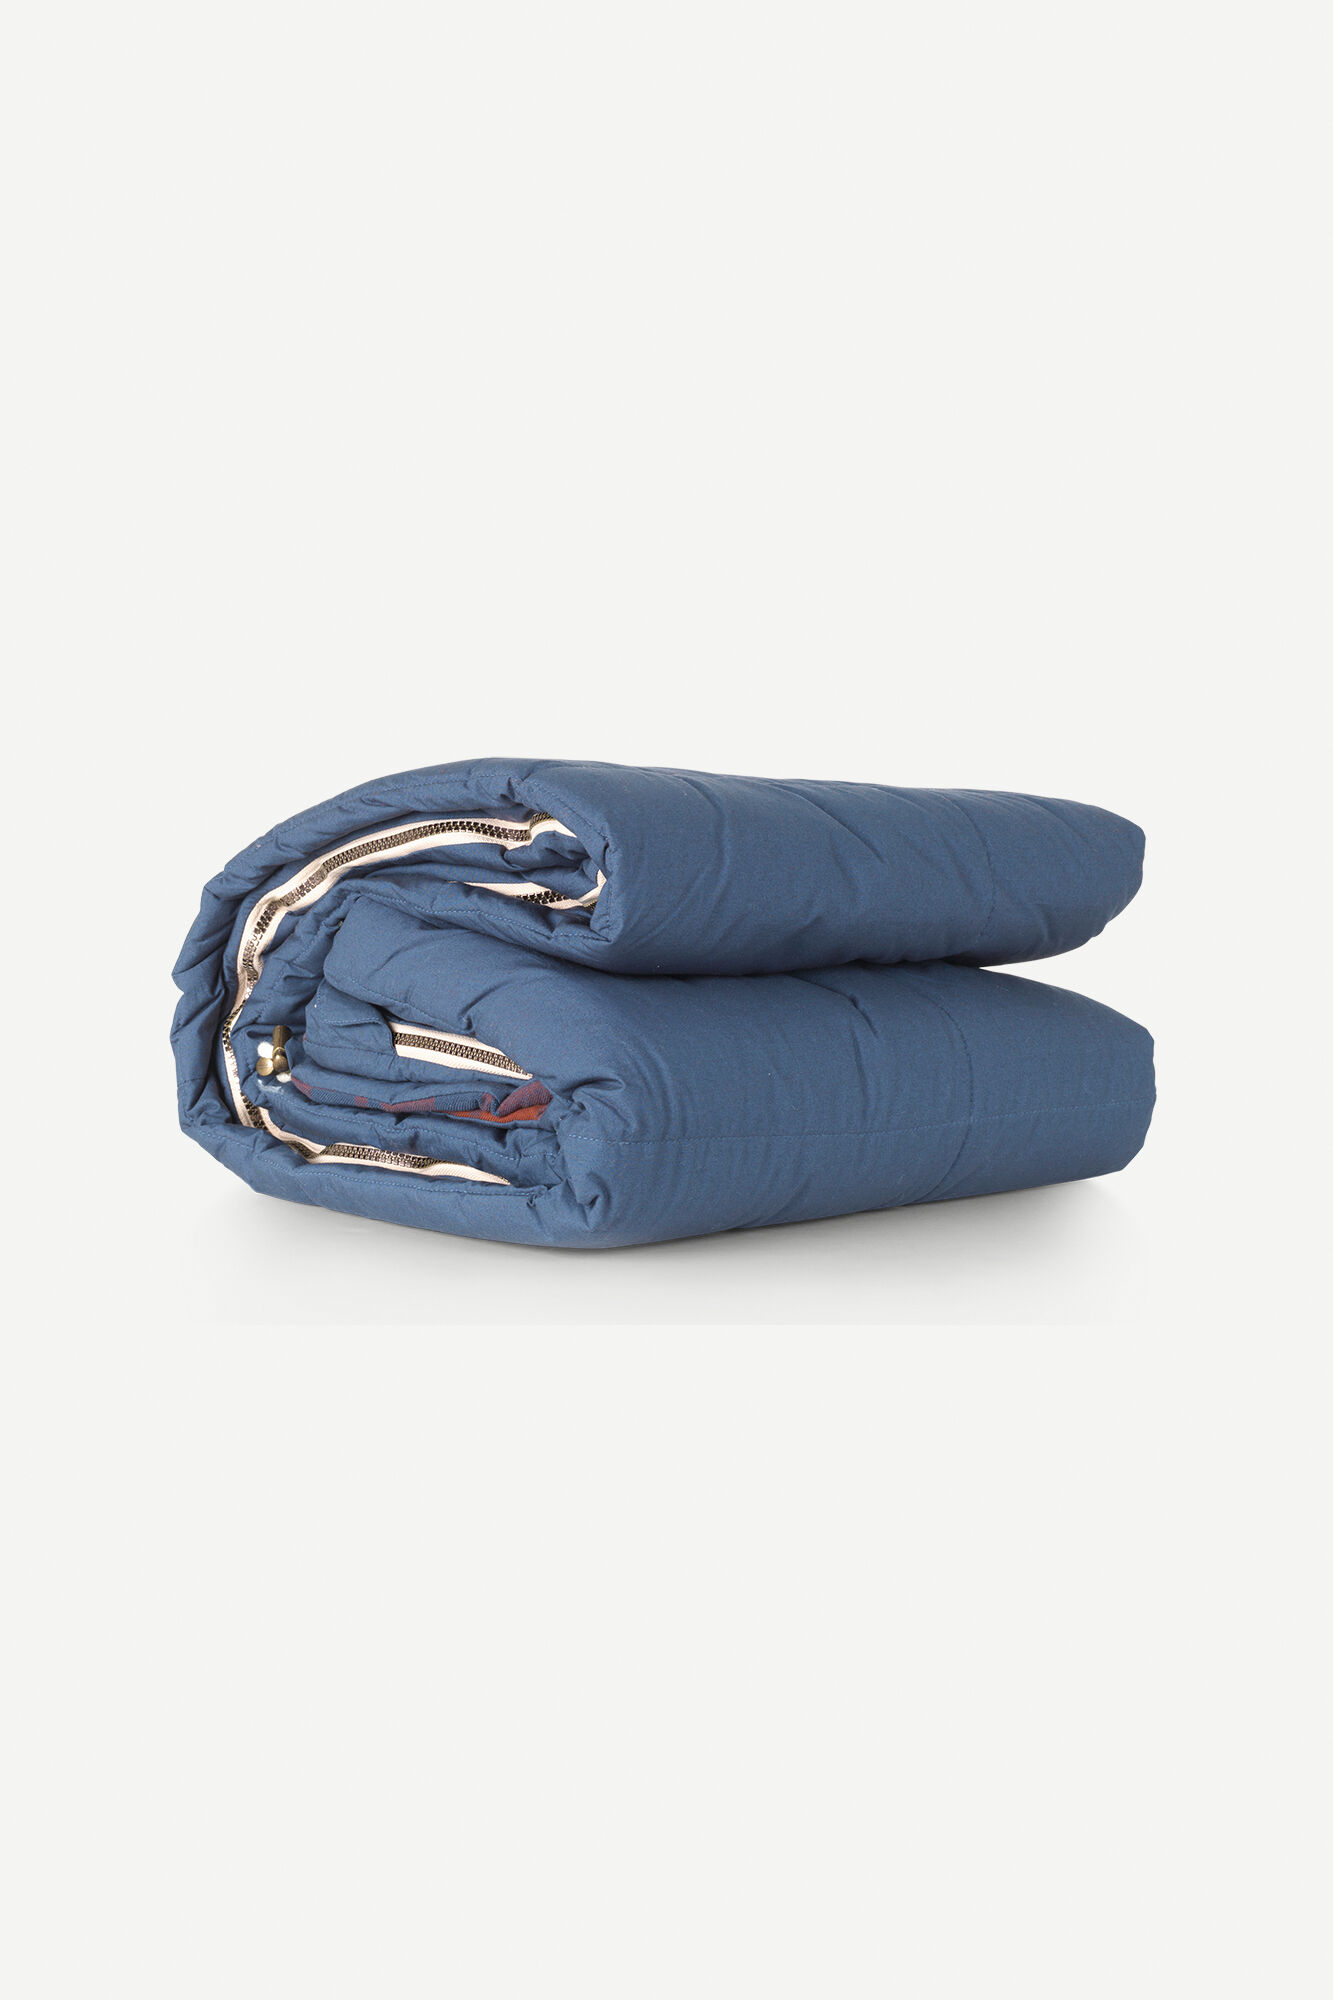 Nordisk Almond Sleepingbag 2C